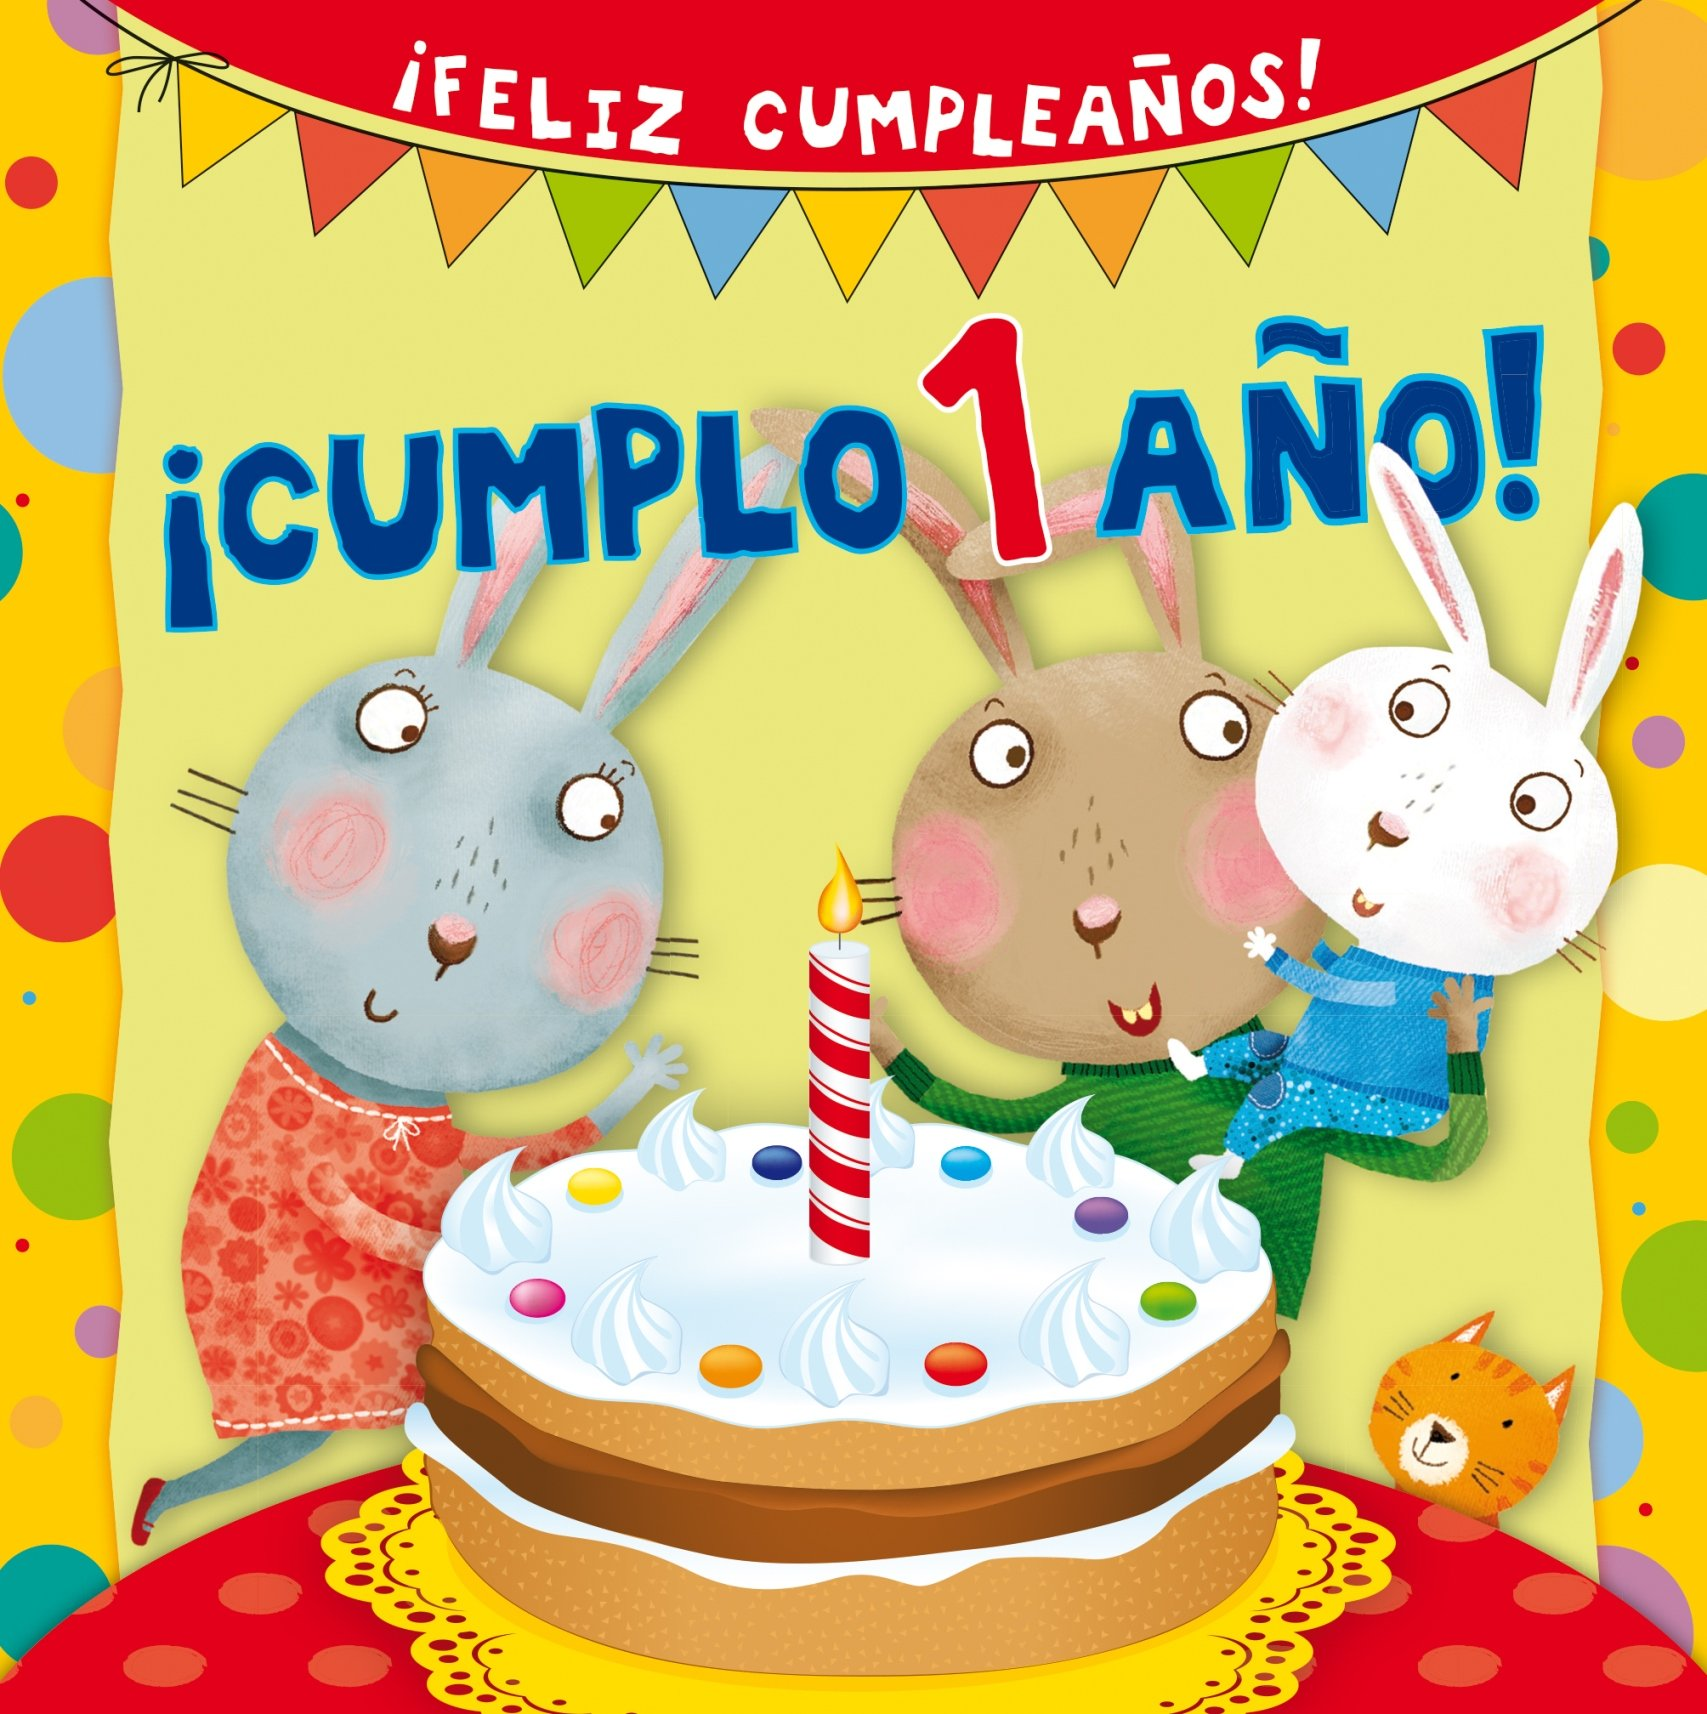 Cumplo 1 ano! (Spanish Edition) (Feliz Cumpleanos!): Silvia ...